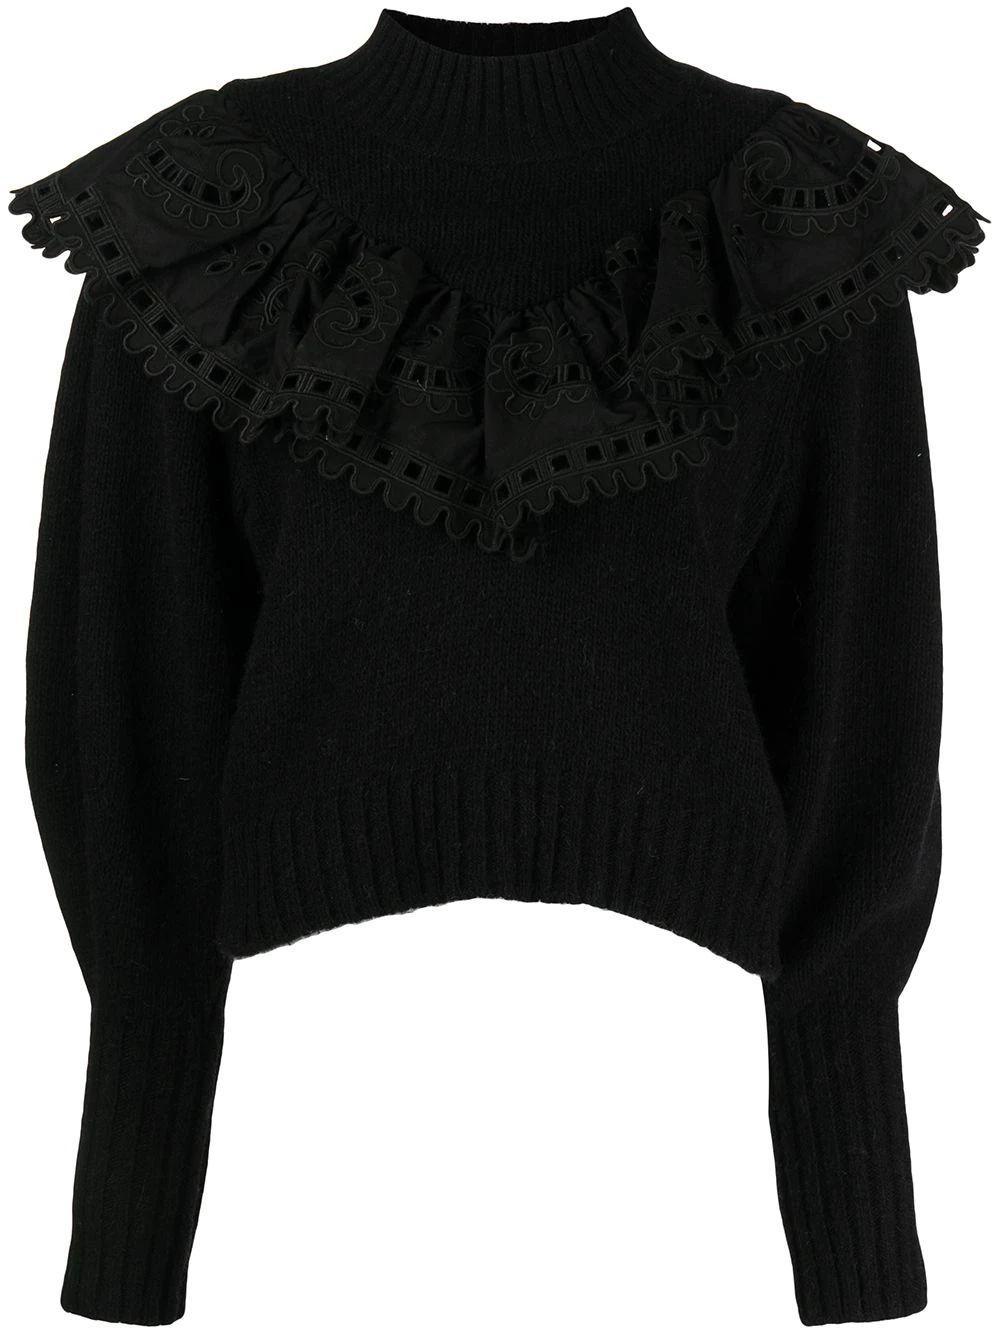 Santos Eyelet Combo Sweater Item # AW21-056